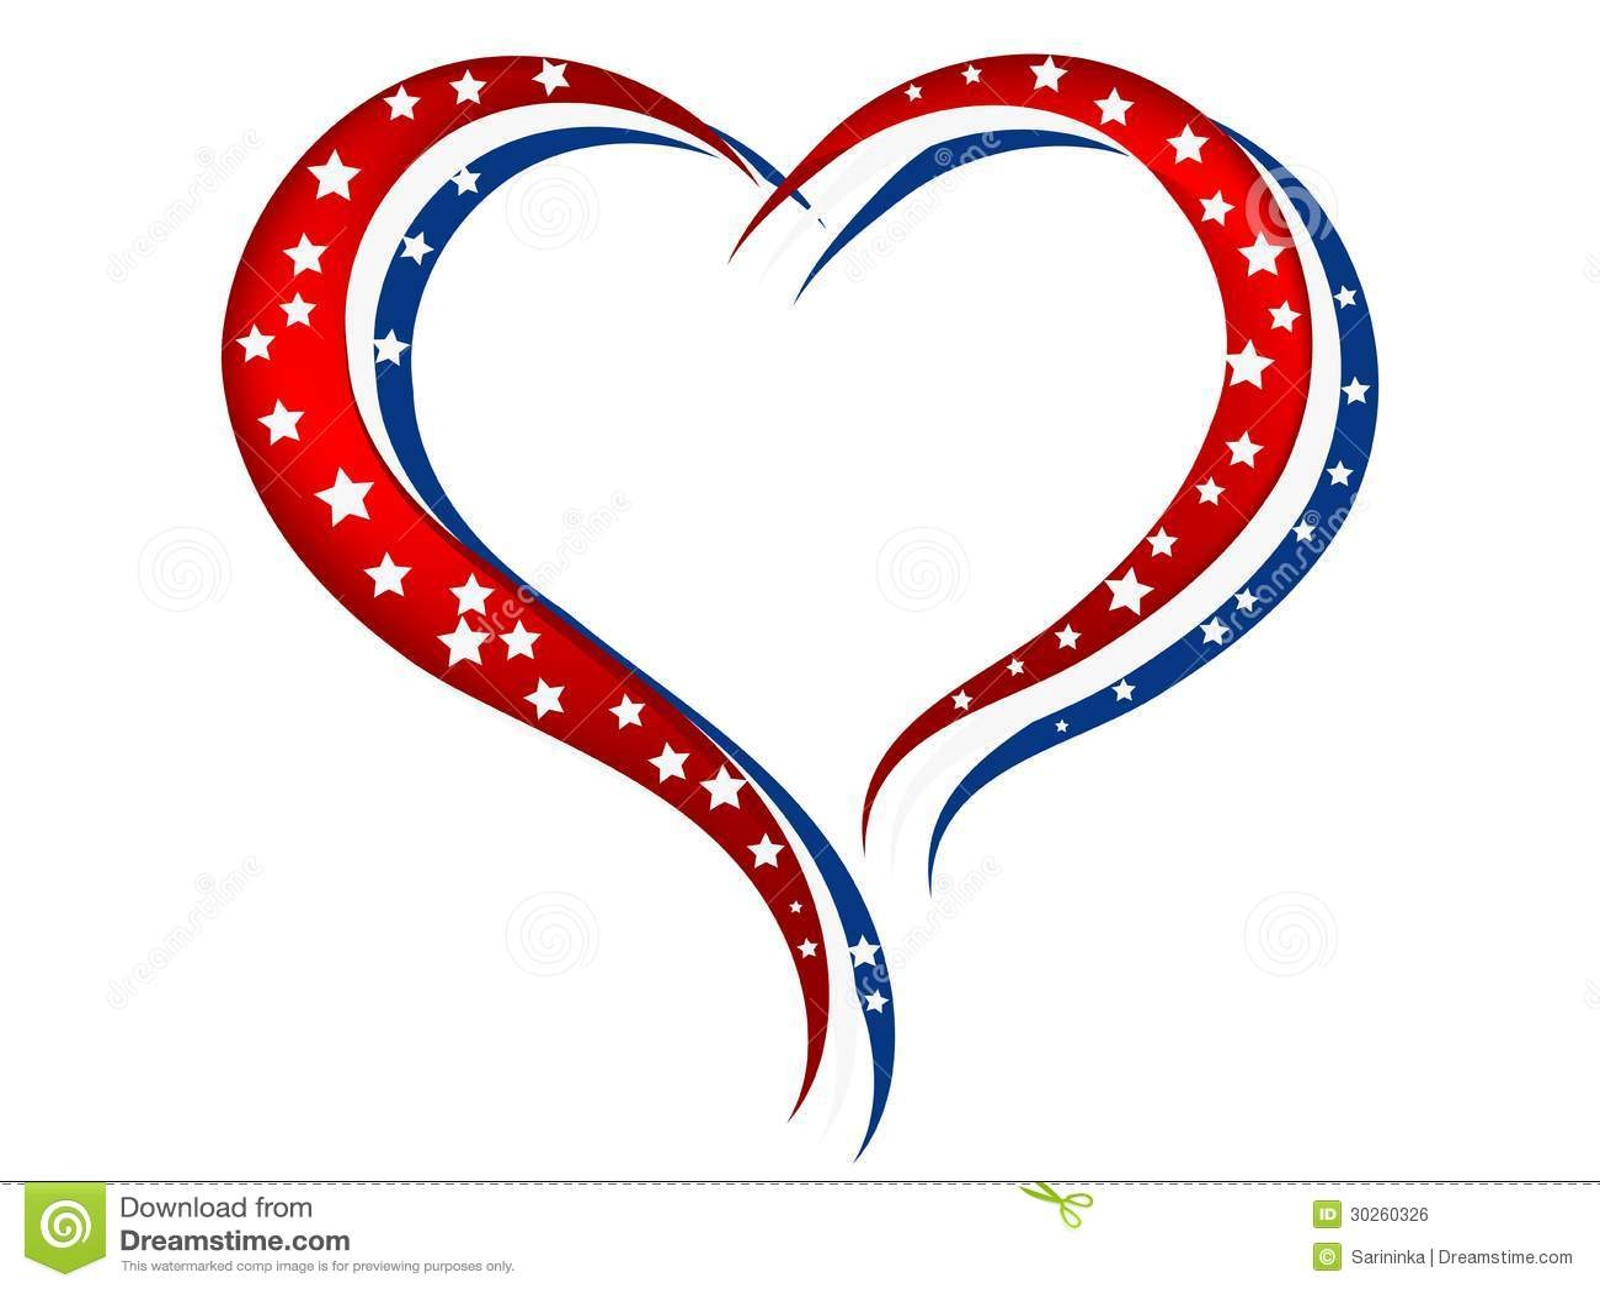 Heart Royalty Free Stock Image - Image: 30260326